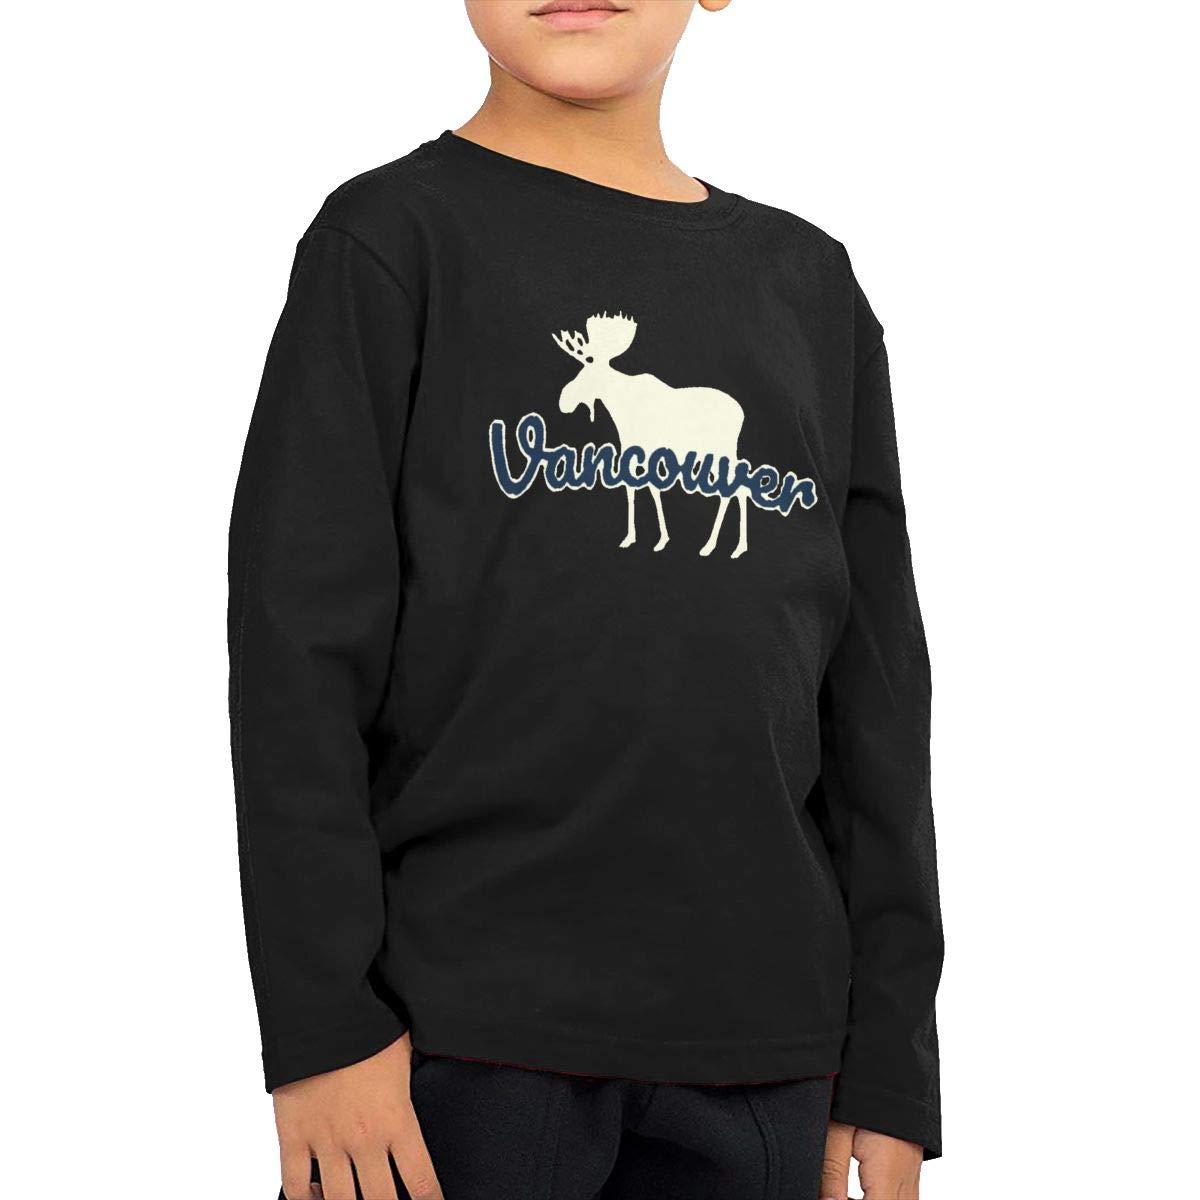 SKYAKLJA Vancouver Moose Childrens Black Cotton Long Sleeve Round Neck T-Shirt for Boy Or Girl